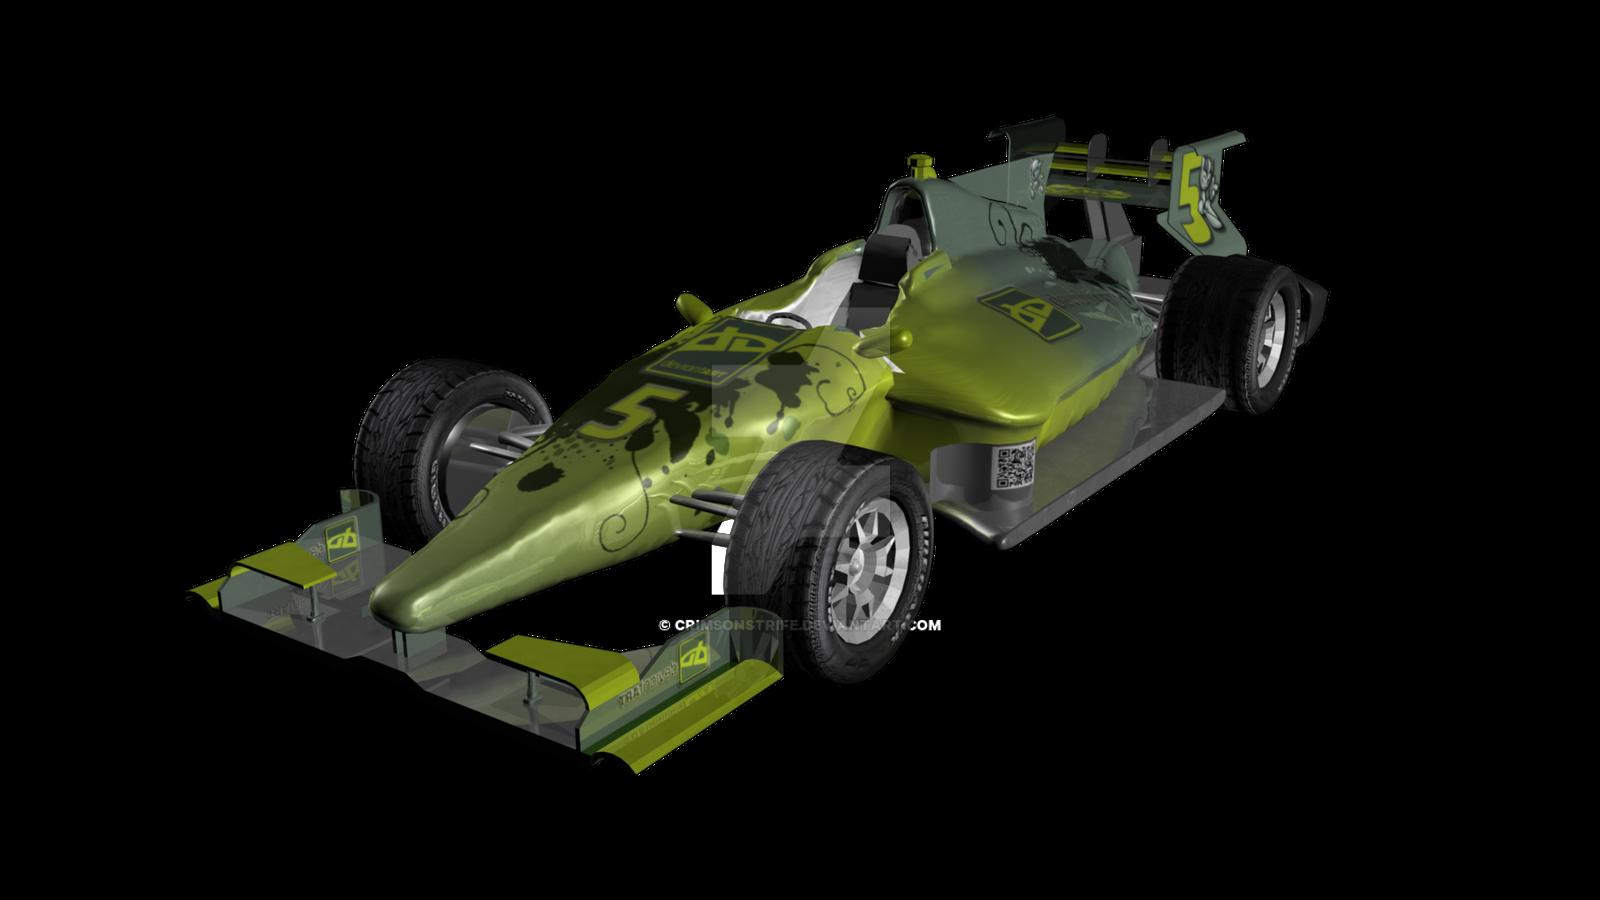 Dallara DeviantArt Racing by CrimsonStrife